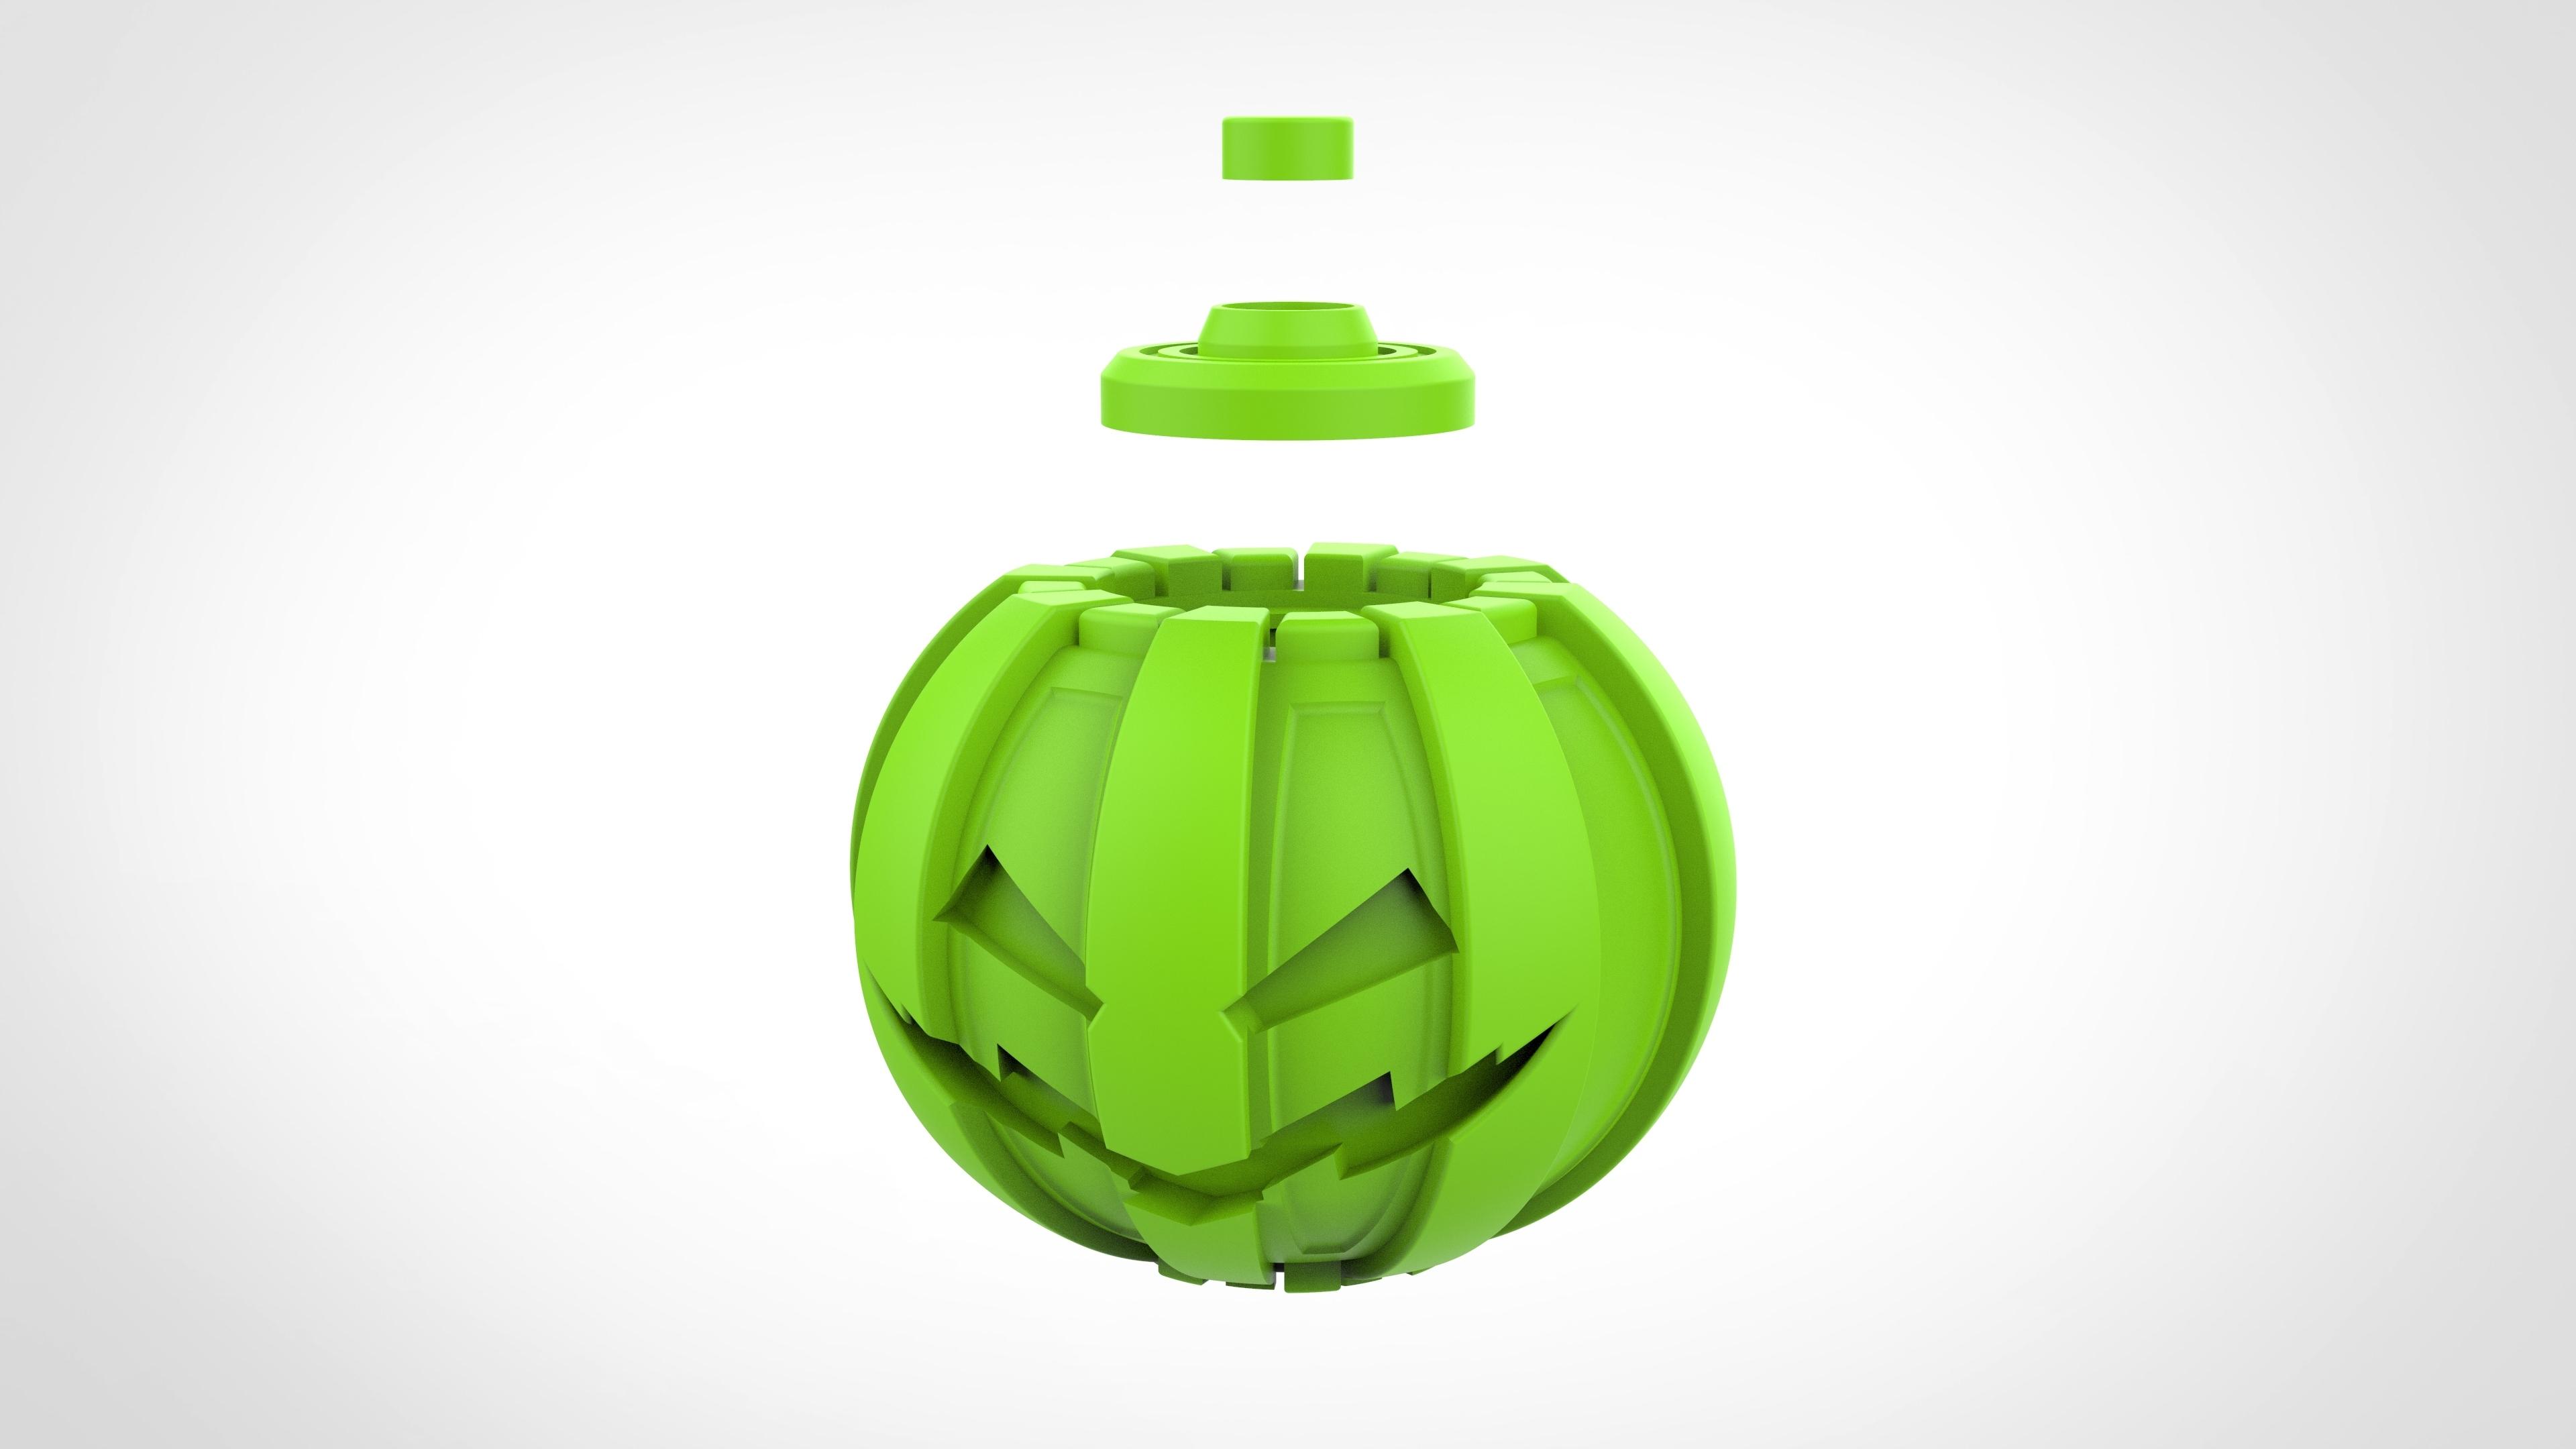 033.jpg Download 3MF file Green goblin bombs from the Spide-Man comics • 3D print model, vetrock